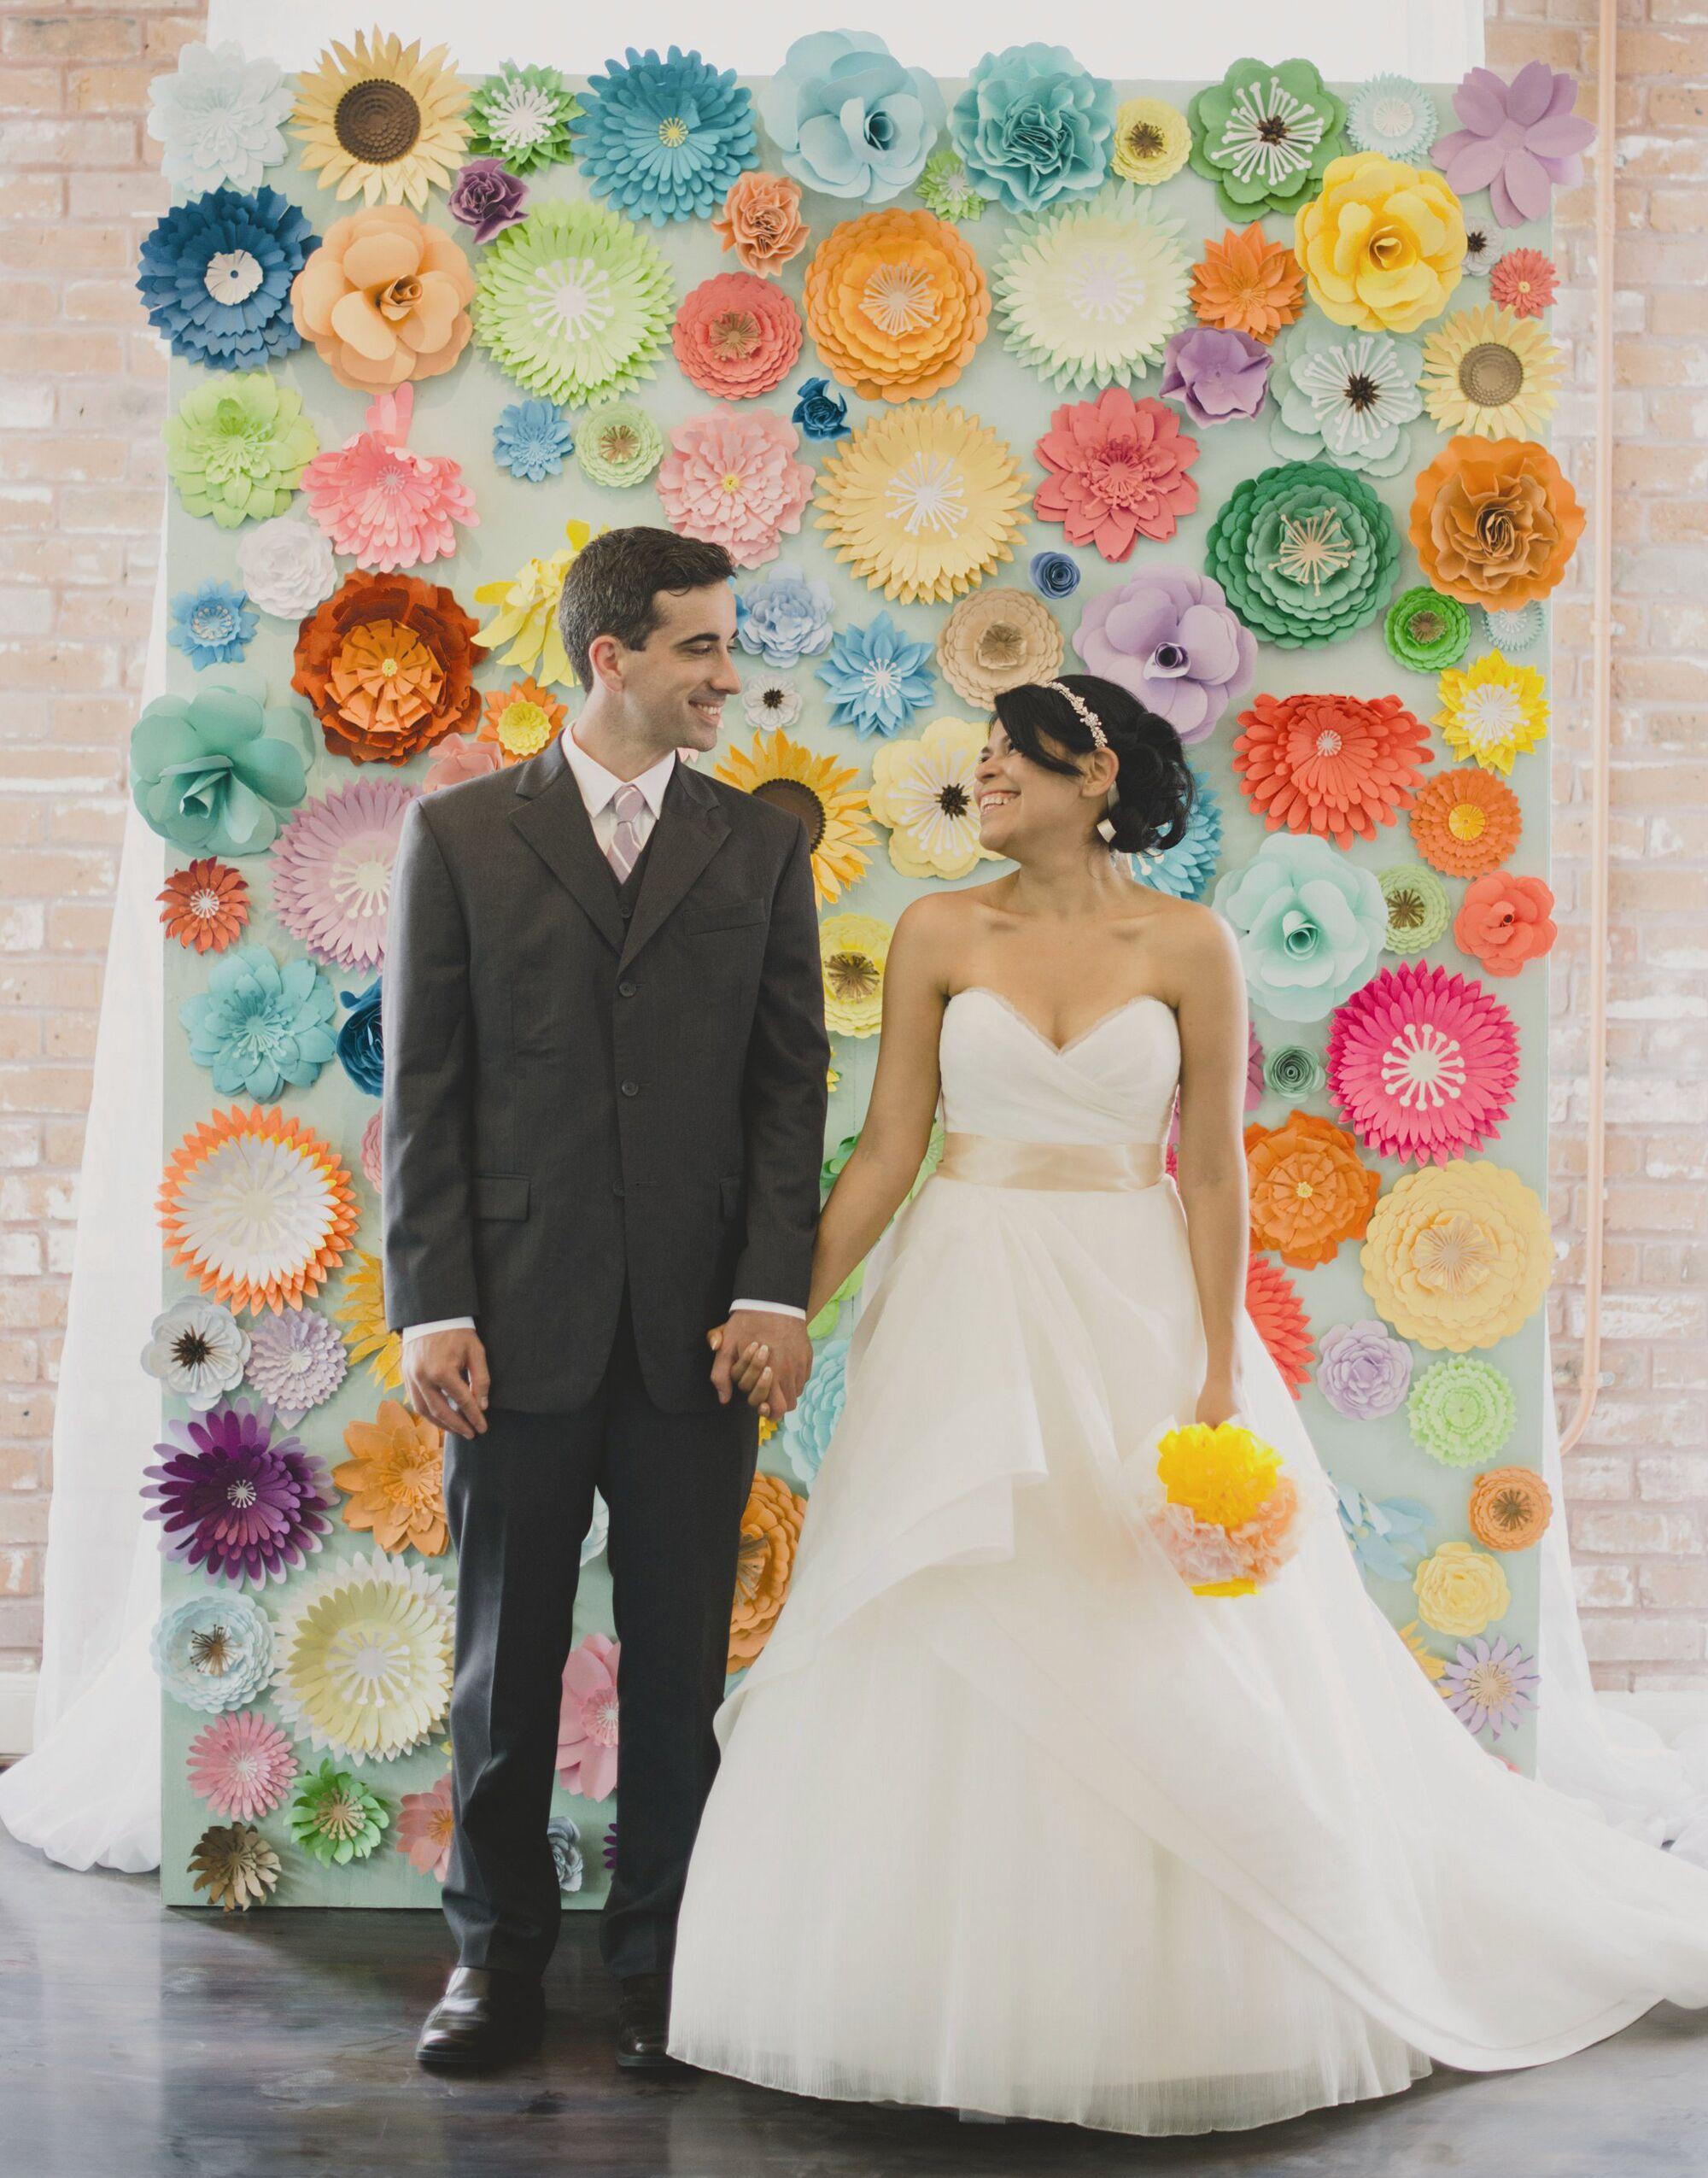 20 Wedding Decorations Ideas Simple Wedding Decorations,Home Design Checklist Template